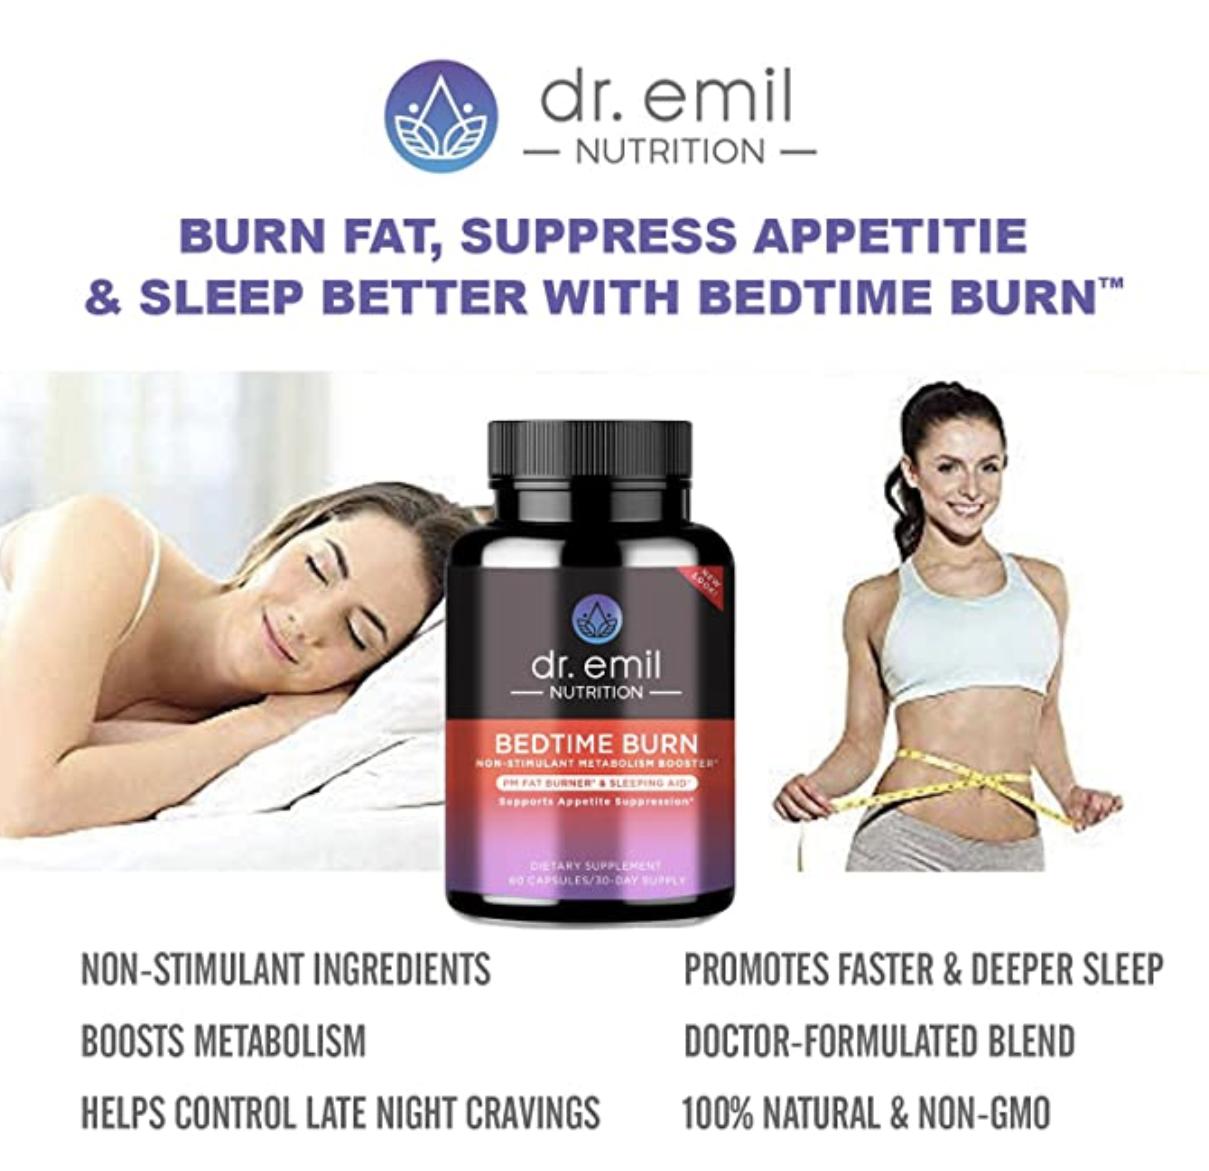 Infographic listing health benefits of Dr. Emil's Bedtime Burn